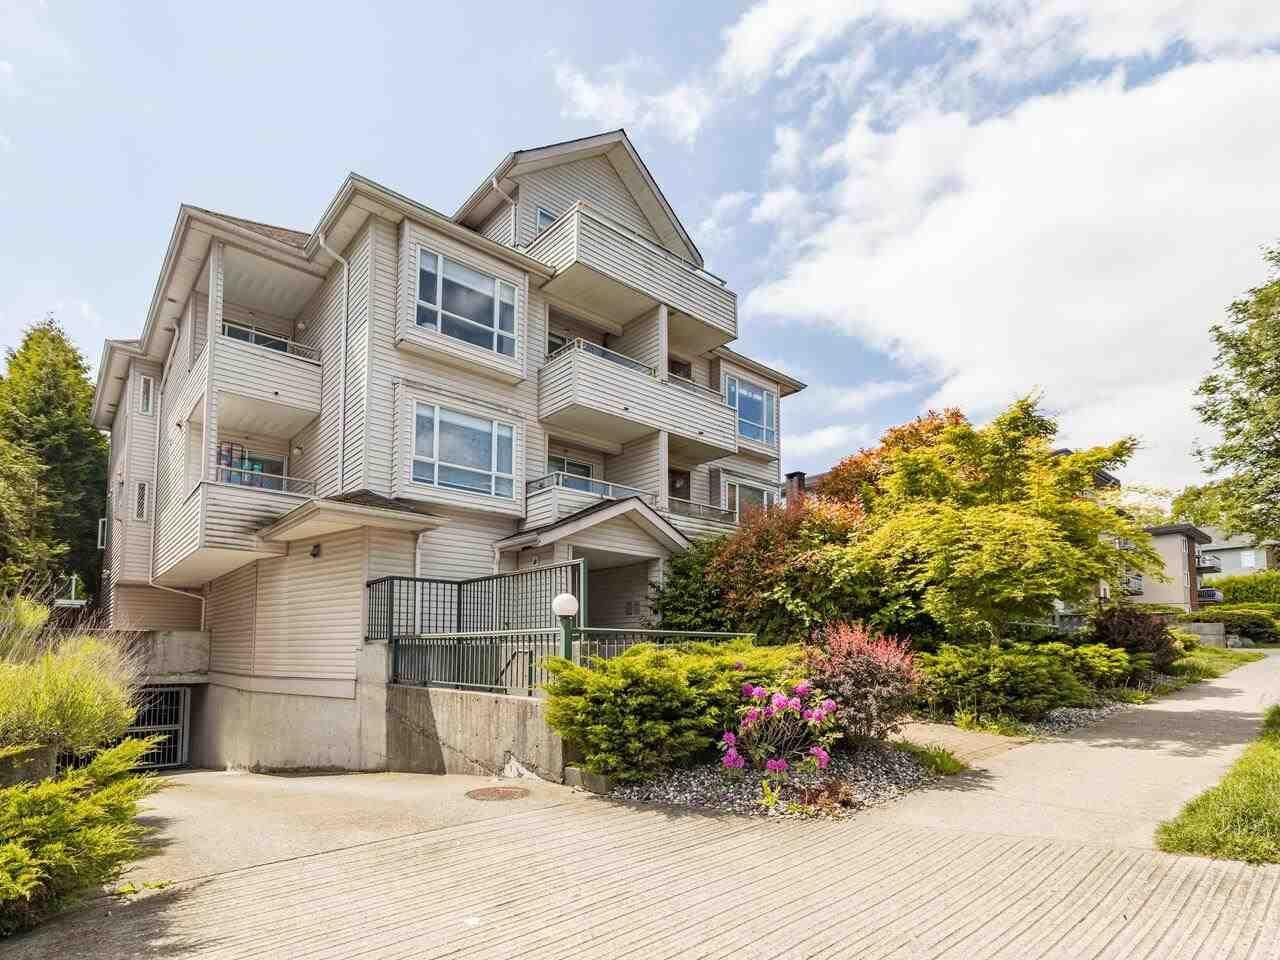 Main Photo: 302 788 E 8TH Avenue in Vancouver: Mount Pleasant VE Condo for sale (Vancouver East)  : MLS®# R2584657